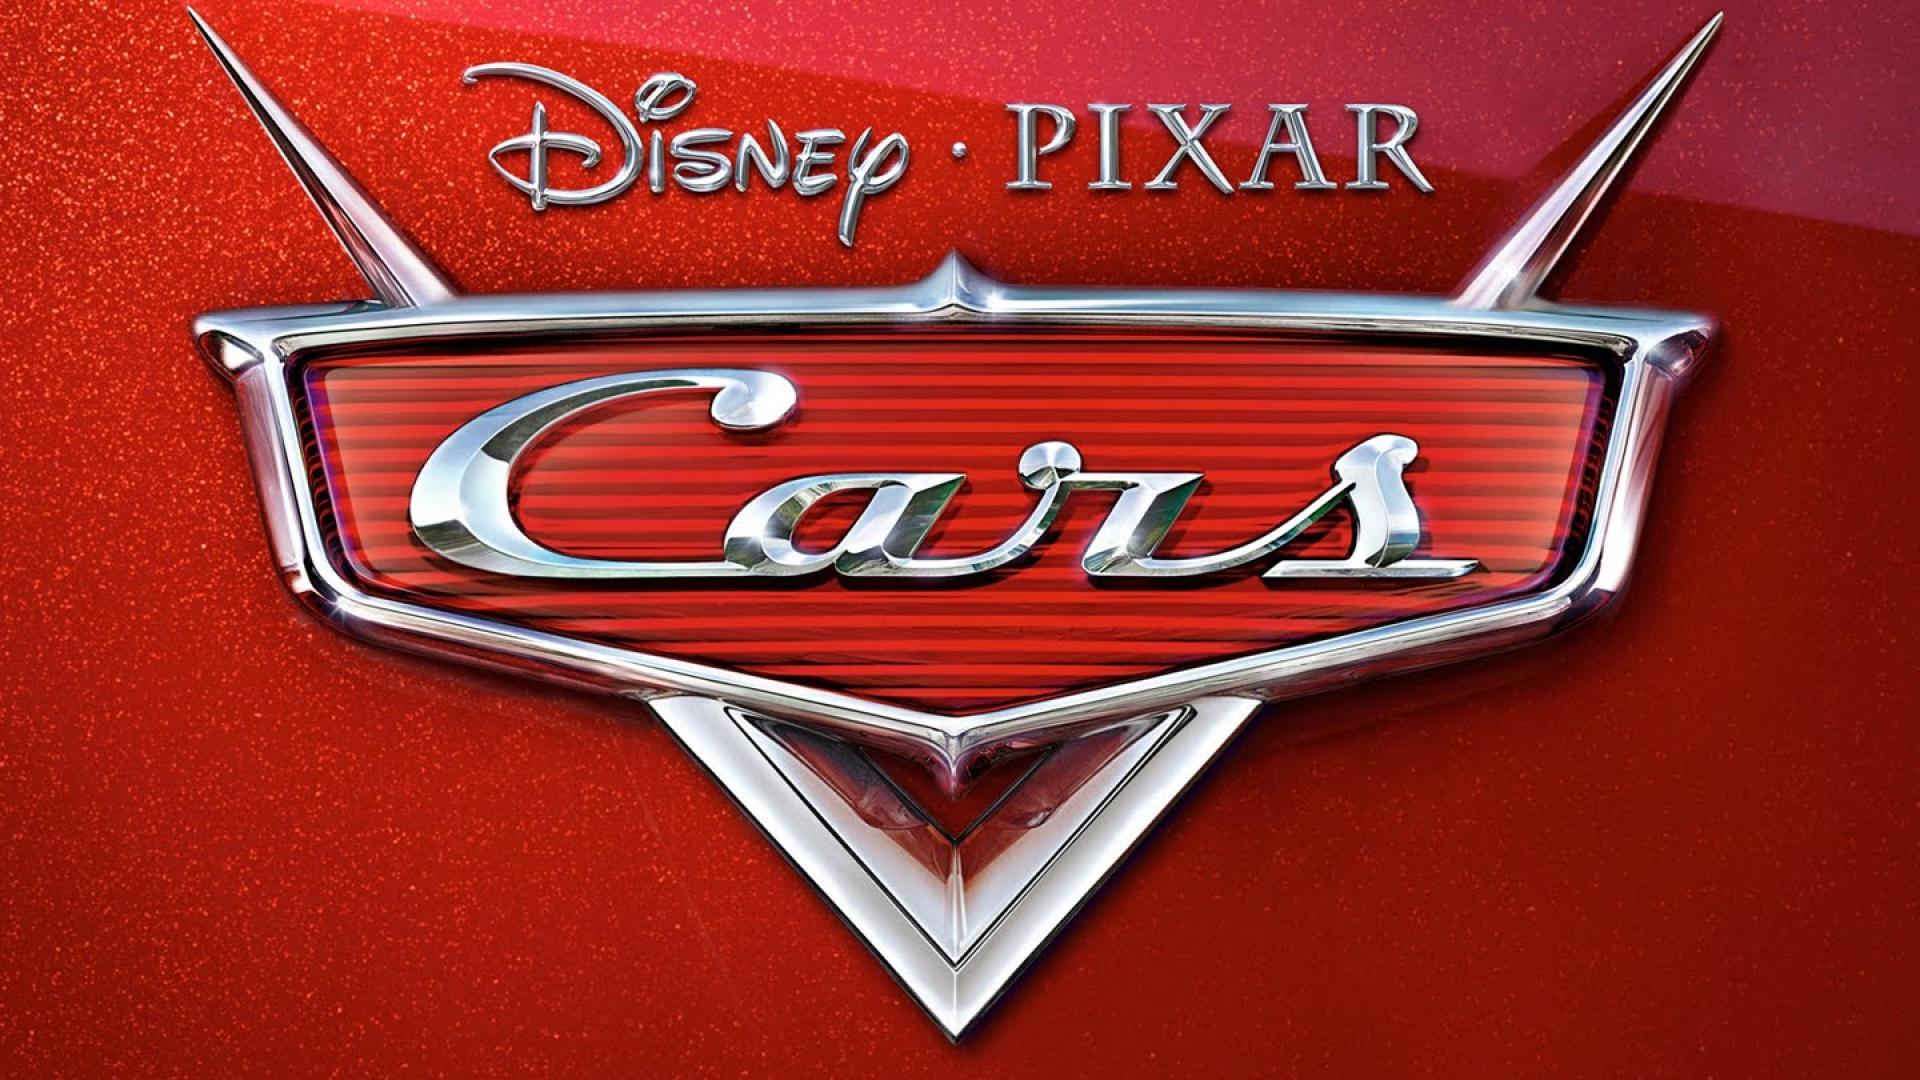 Disney Pixar Cars Wallpaper wallpaper   964327 1920x1080